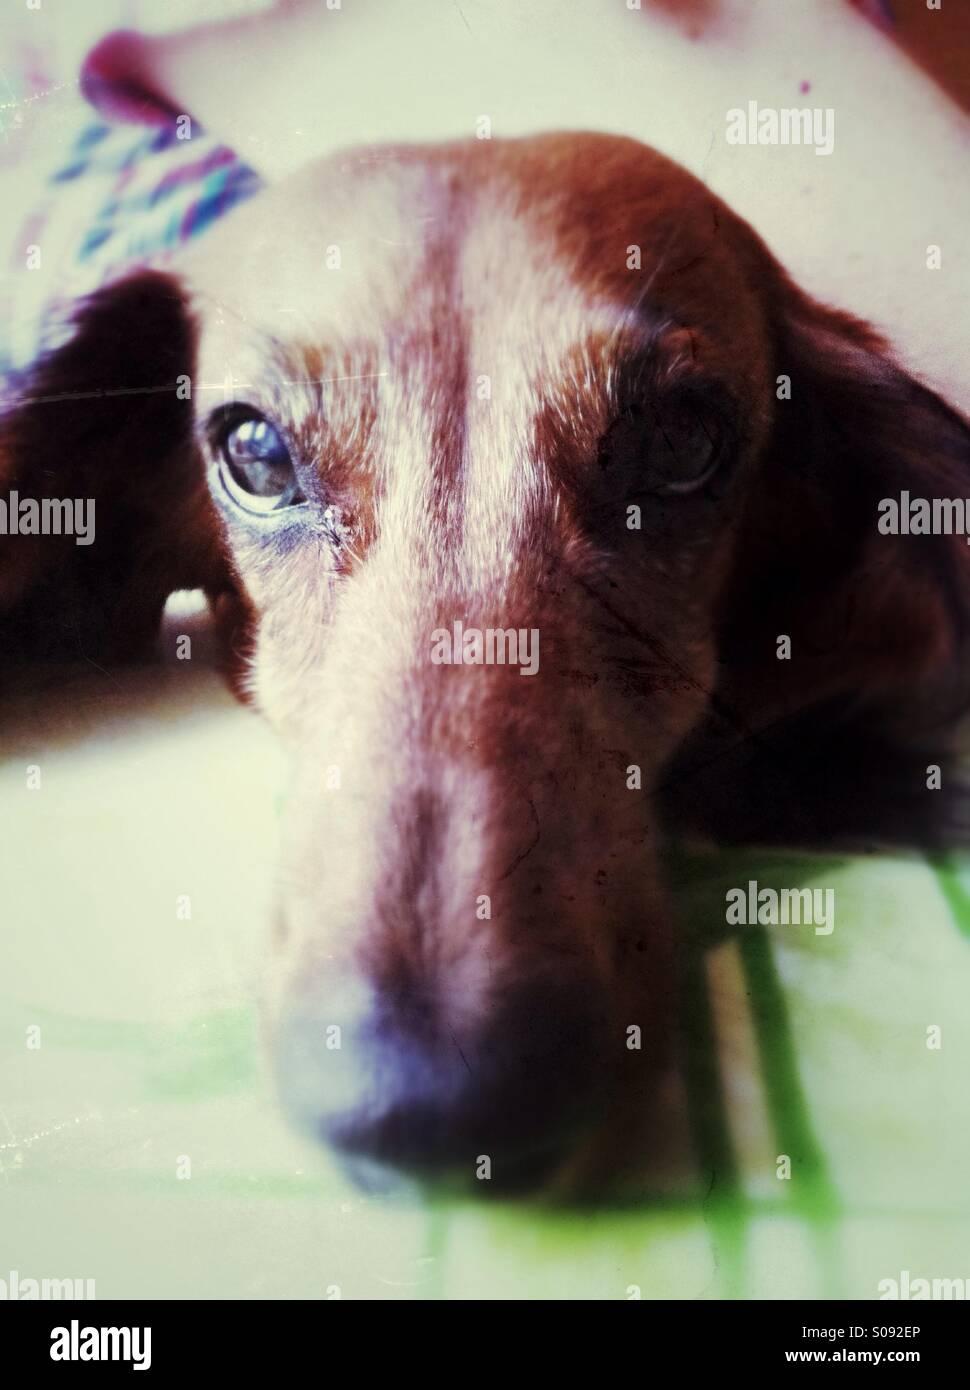 Lindo perro retrato Imagen De Stock